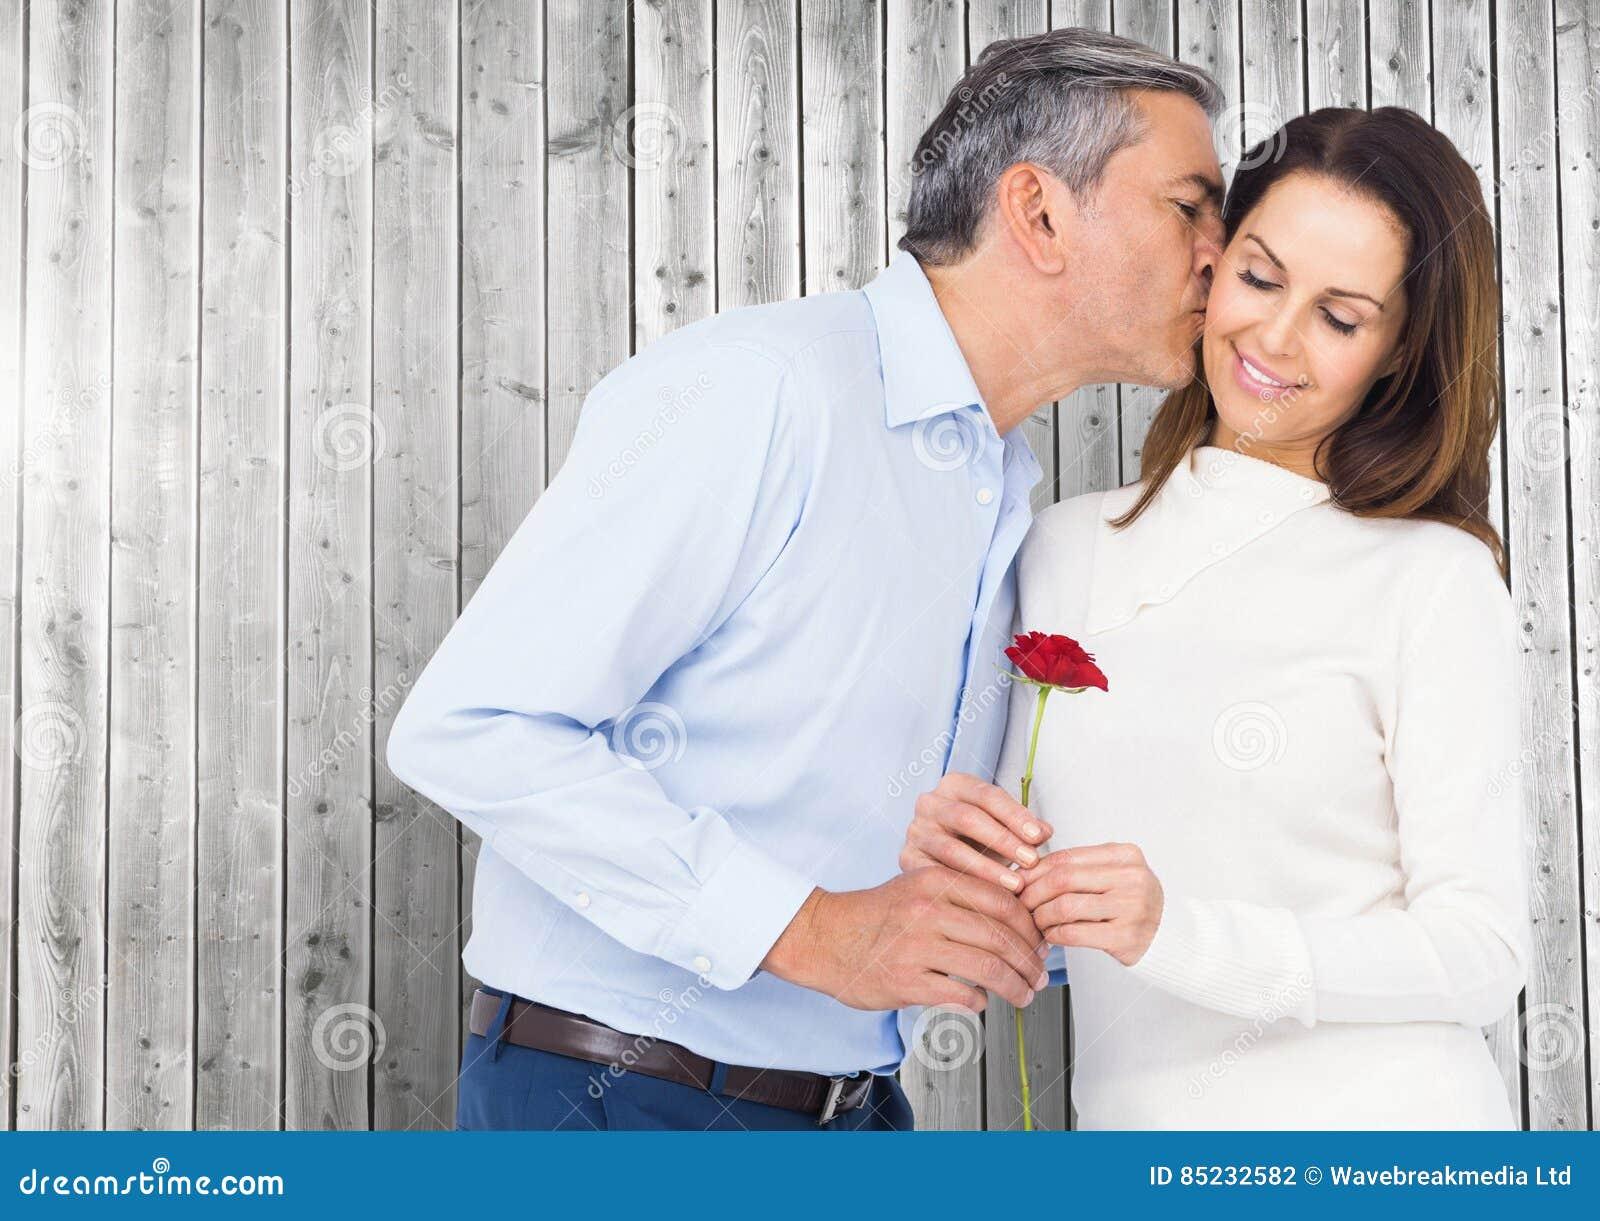 Statistics of same sex marriage